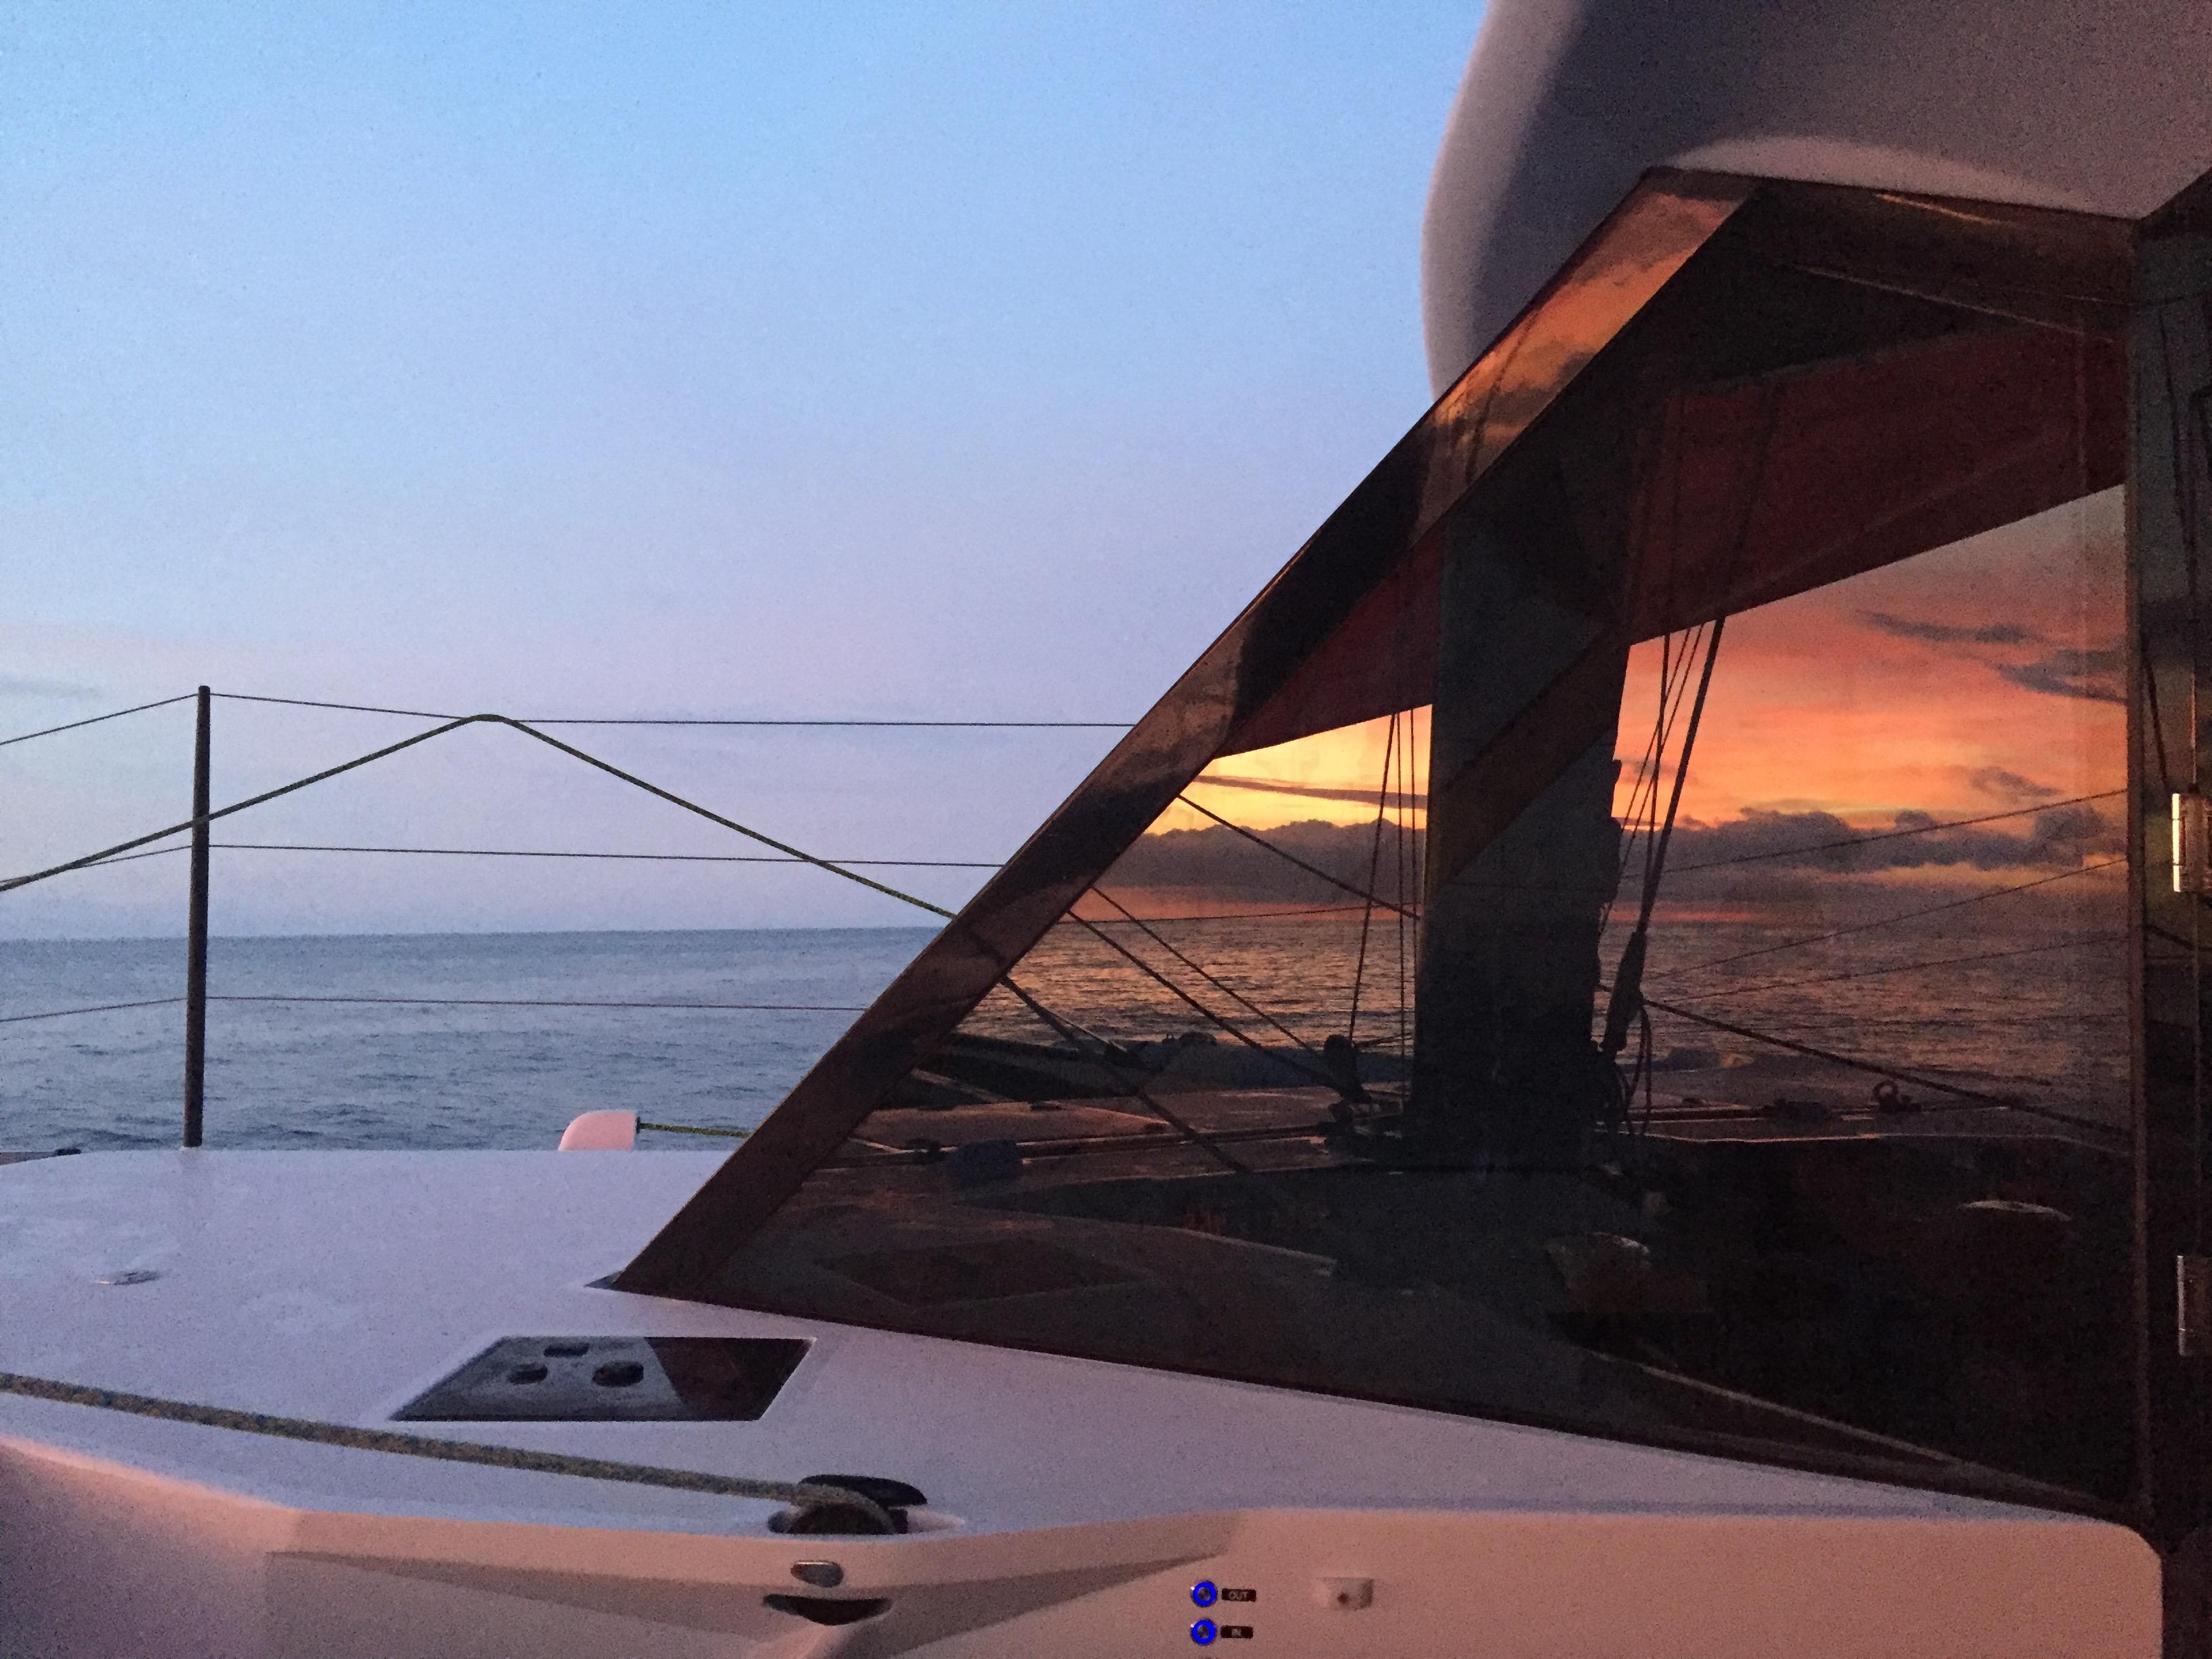 Transat Sunrise reflection